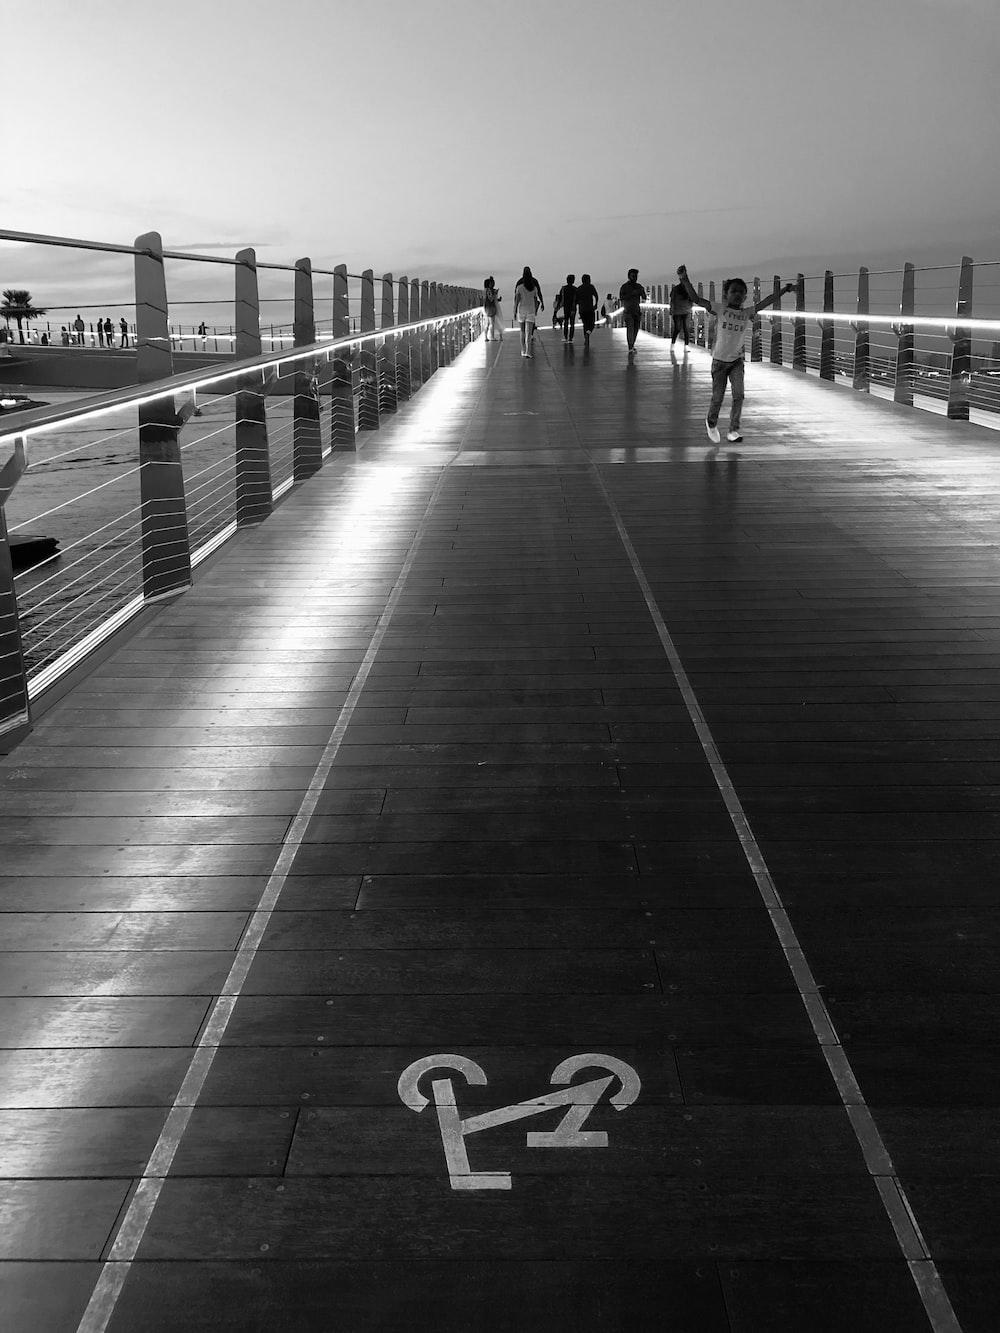 people standing and walking on bridge